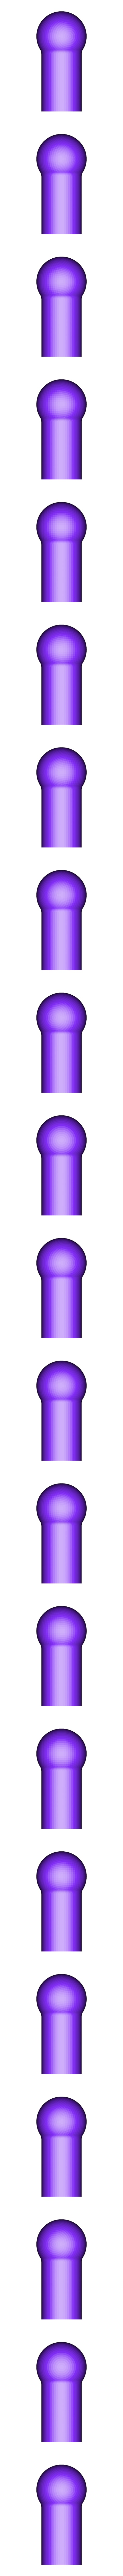 embout tube 12.stl Download free STL file Pipe brackets dia 12 • 3D printing model, mk25